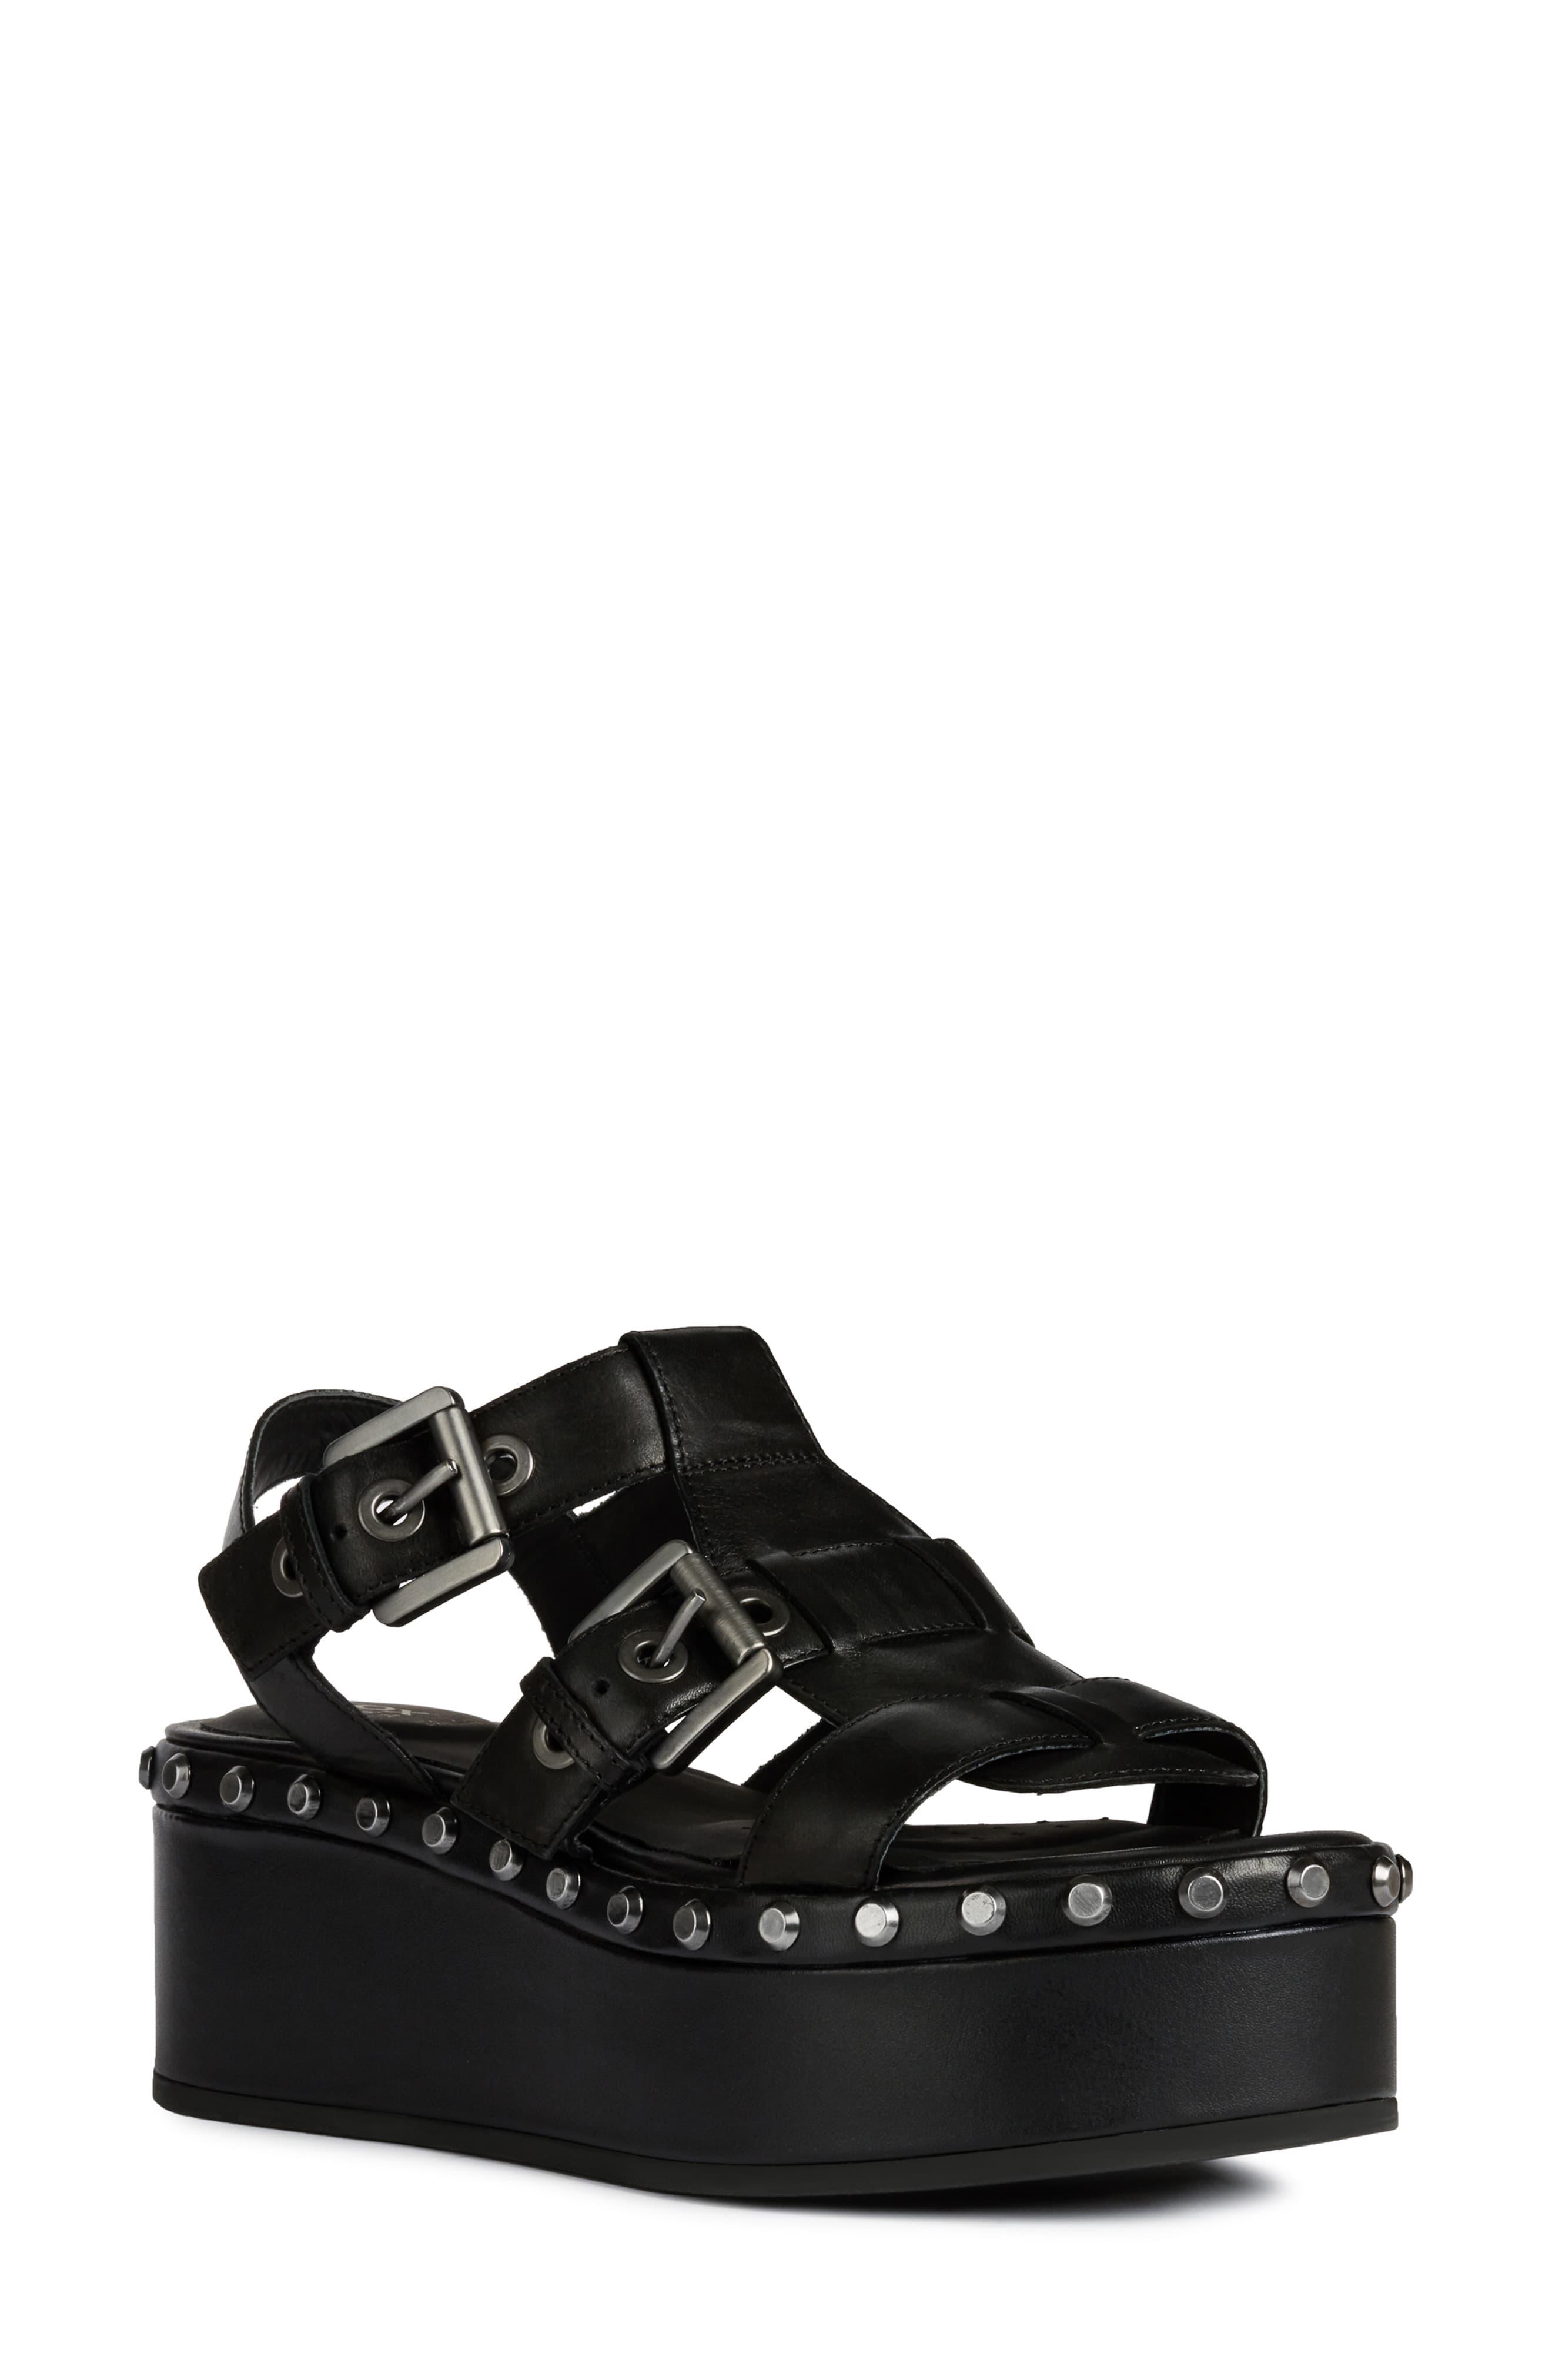 zapatos geox sandalias negras zapatillas